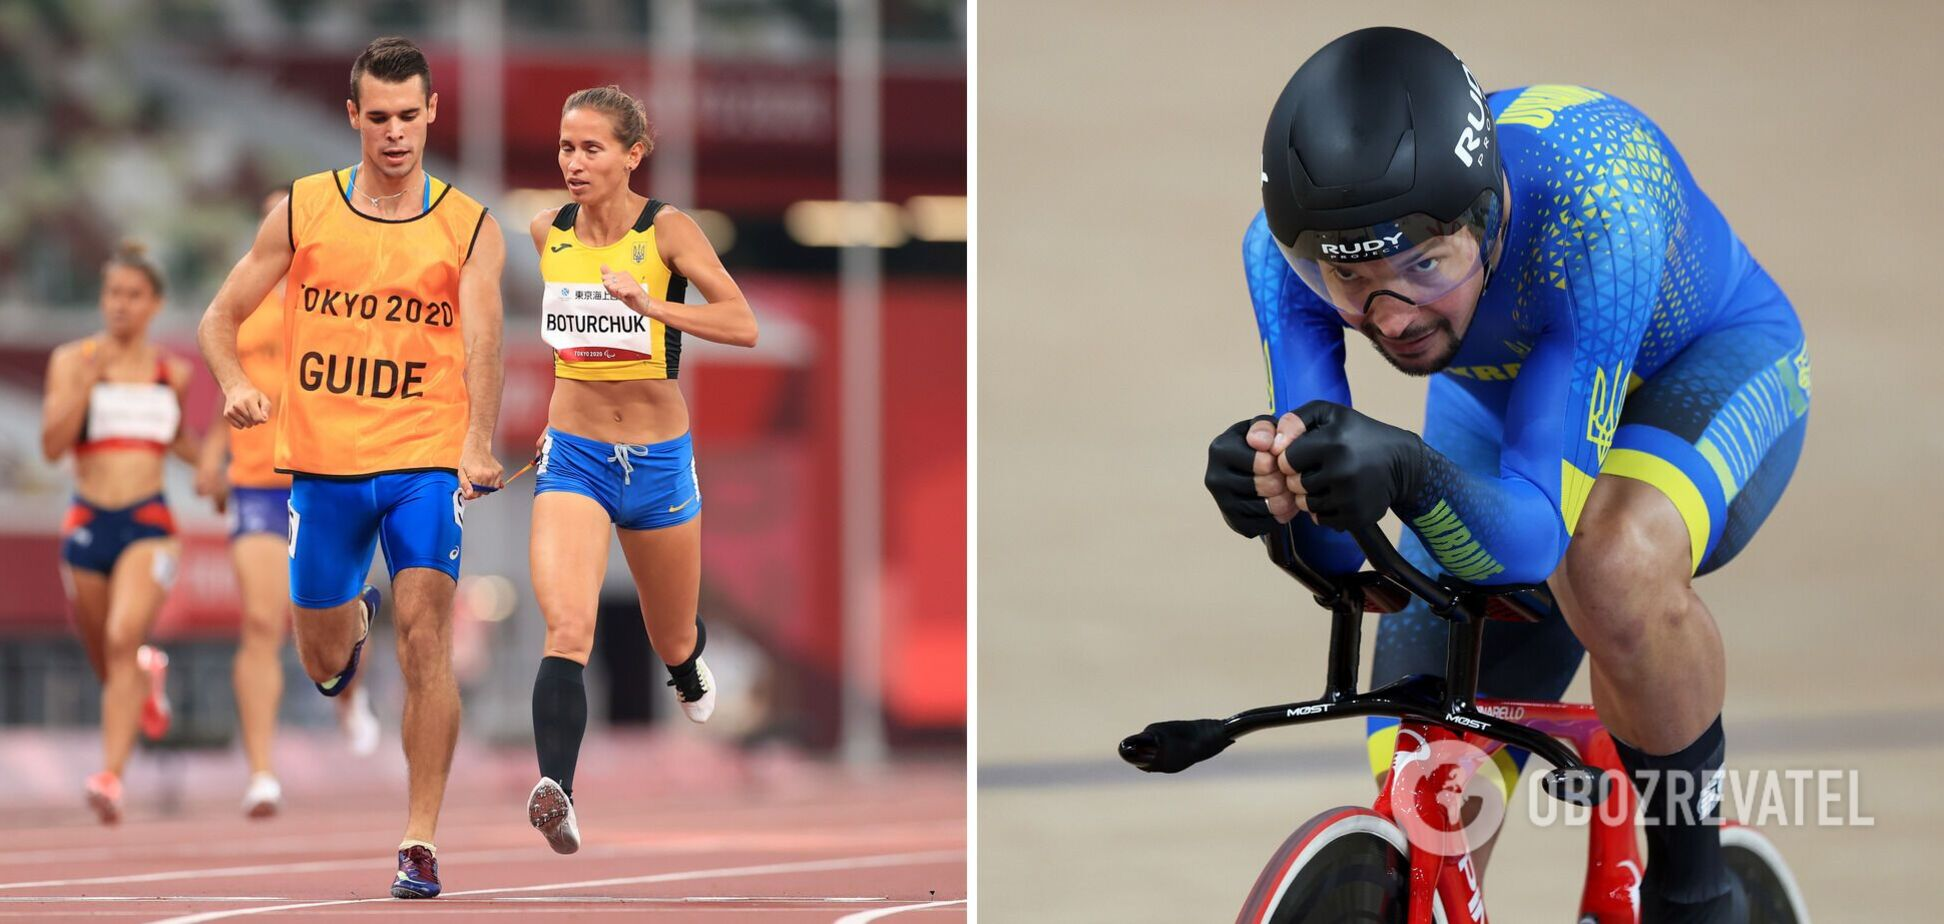 Дементьев и Ботурчук выиграли 'серебро' на Паралимпиаде-2020